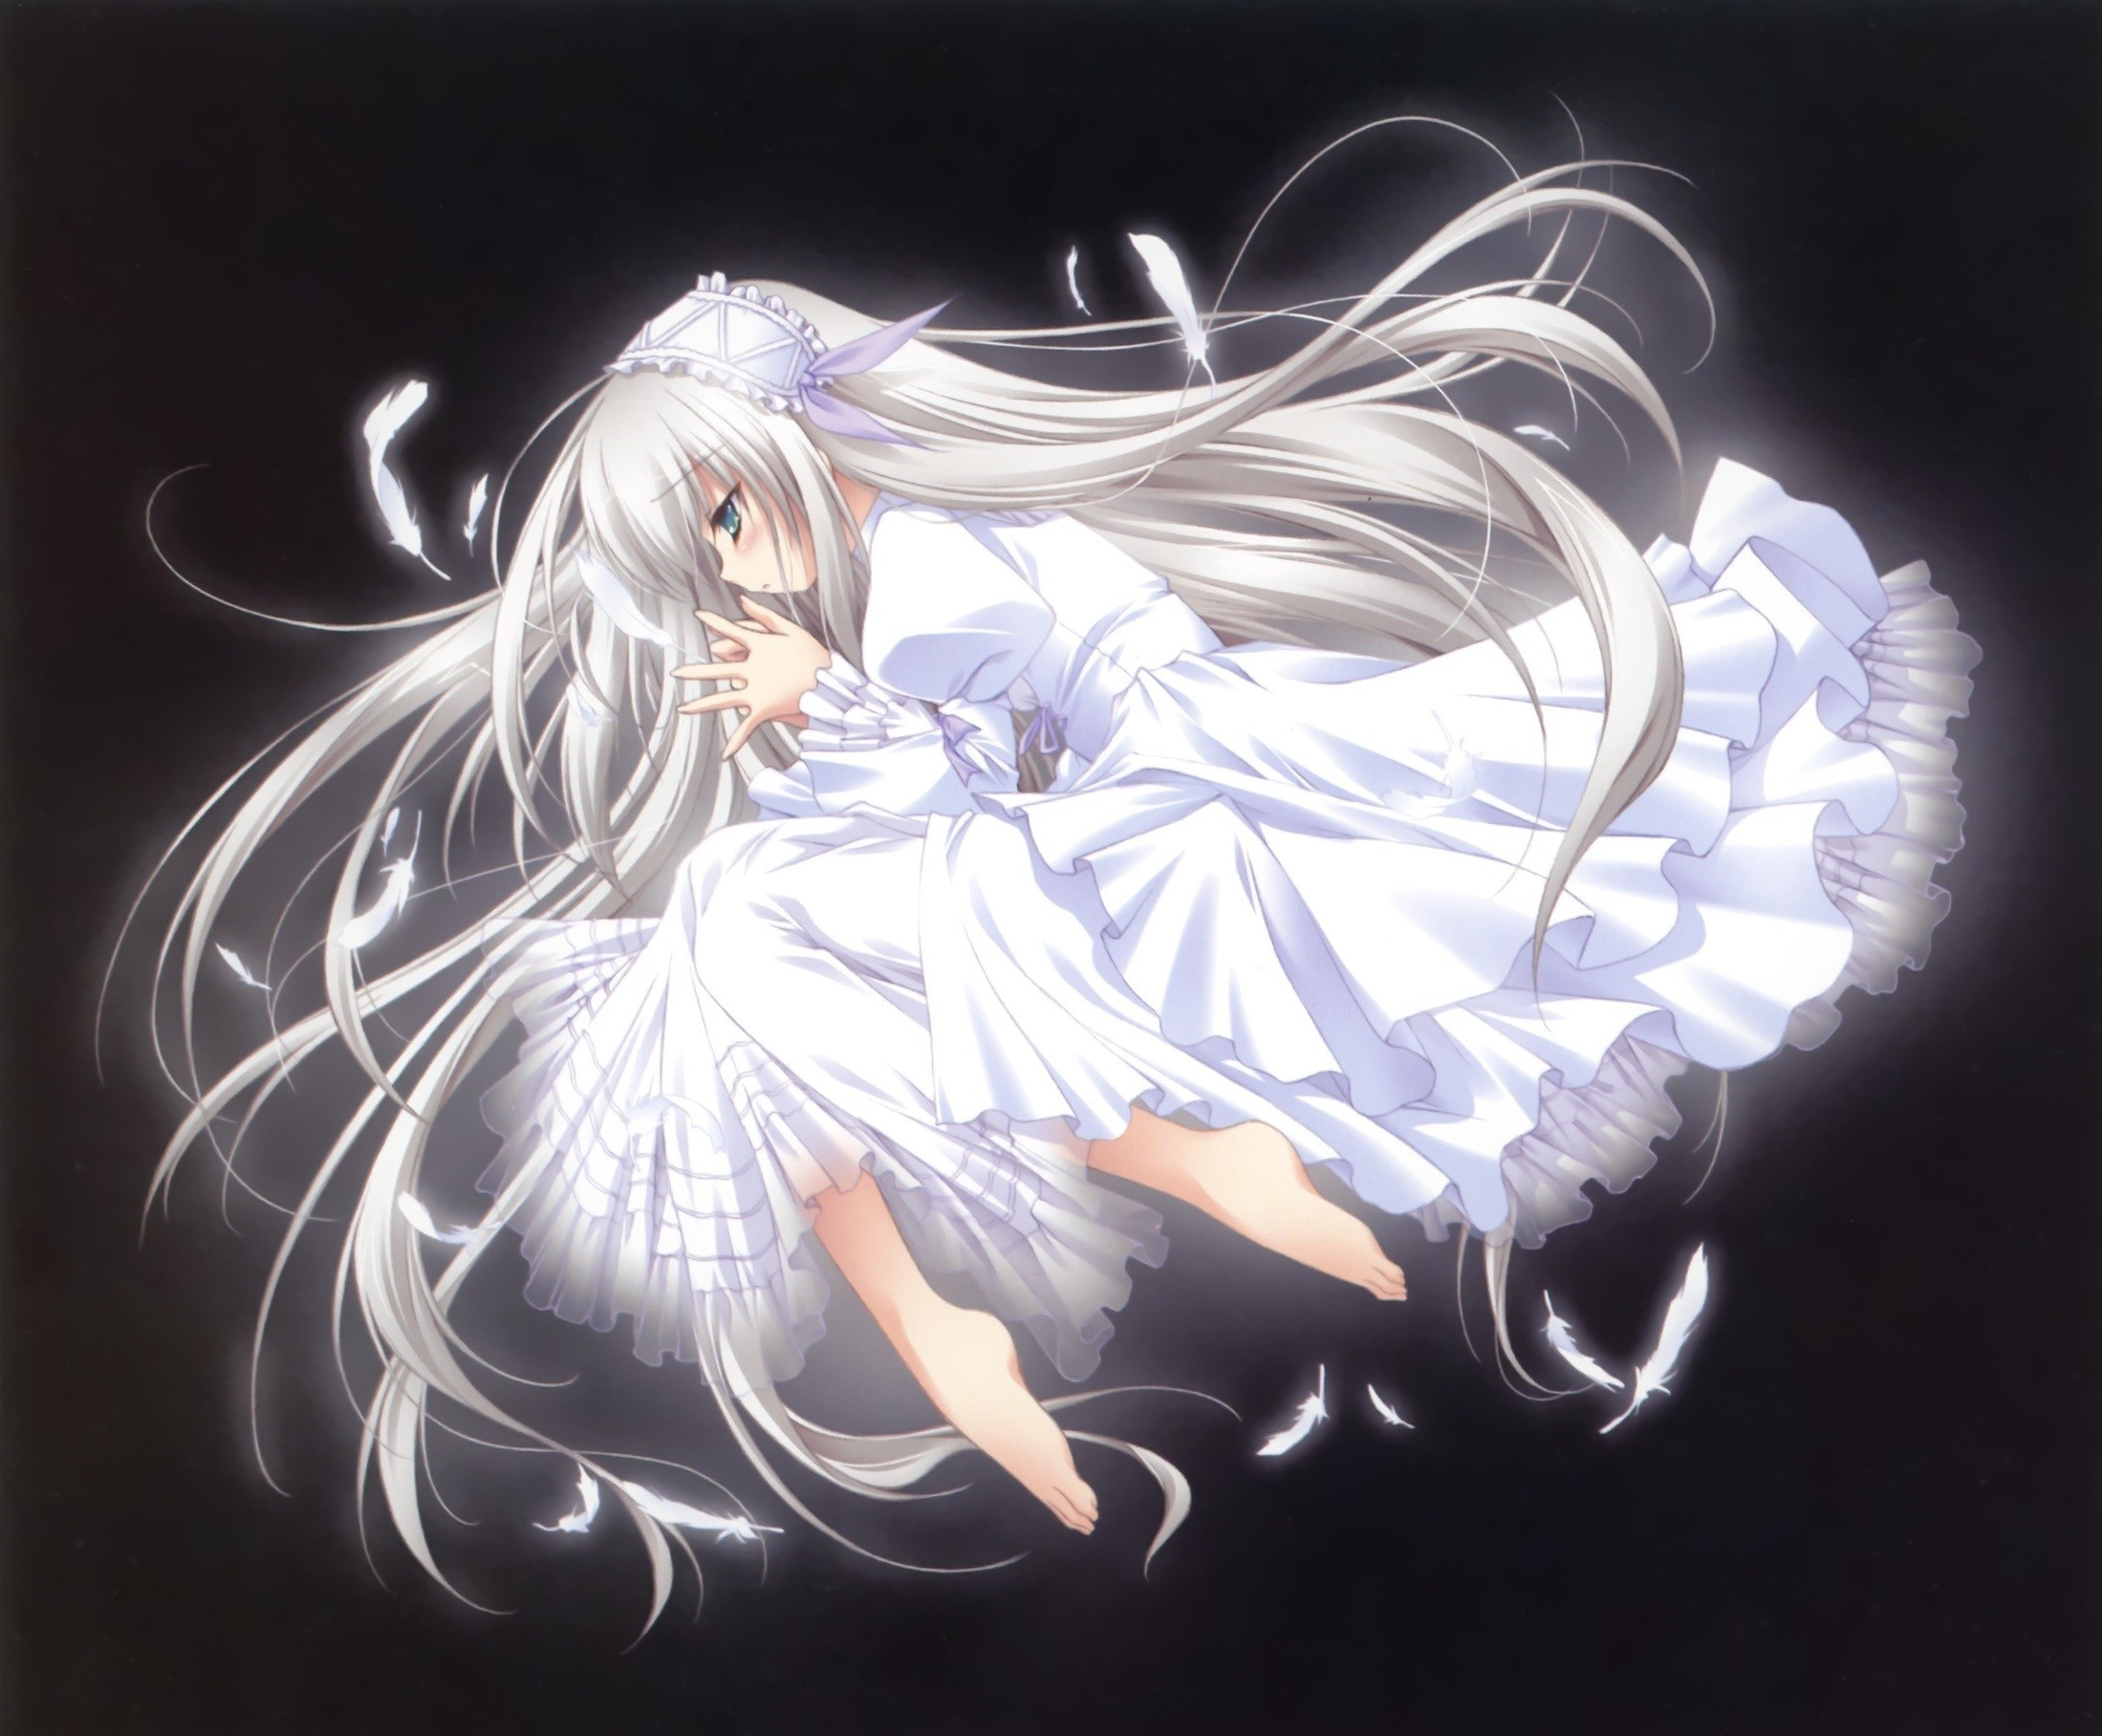 11-Eyes blue eyes dress feathers lisette vertorre long hair white .